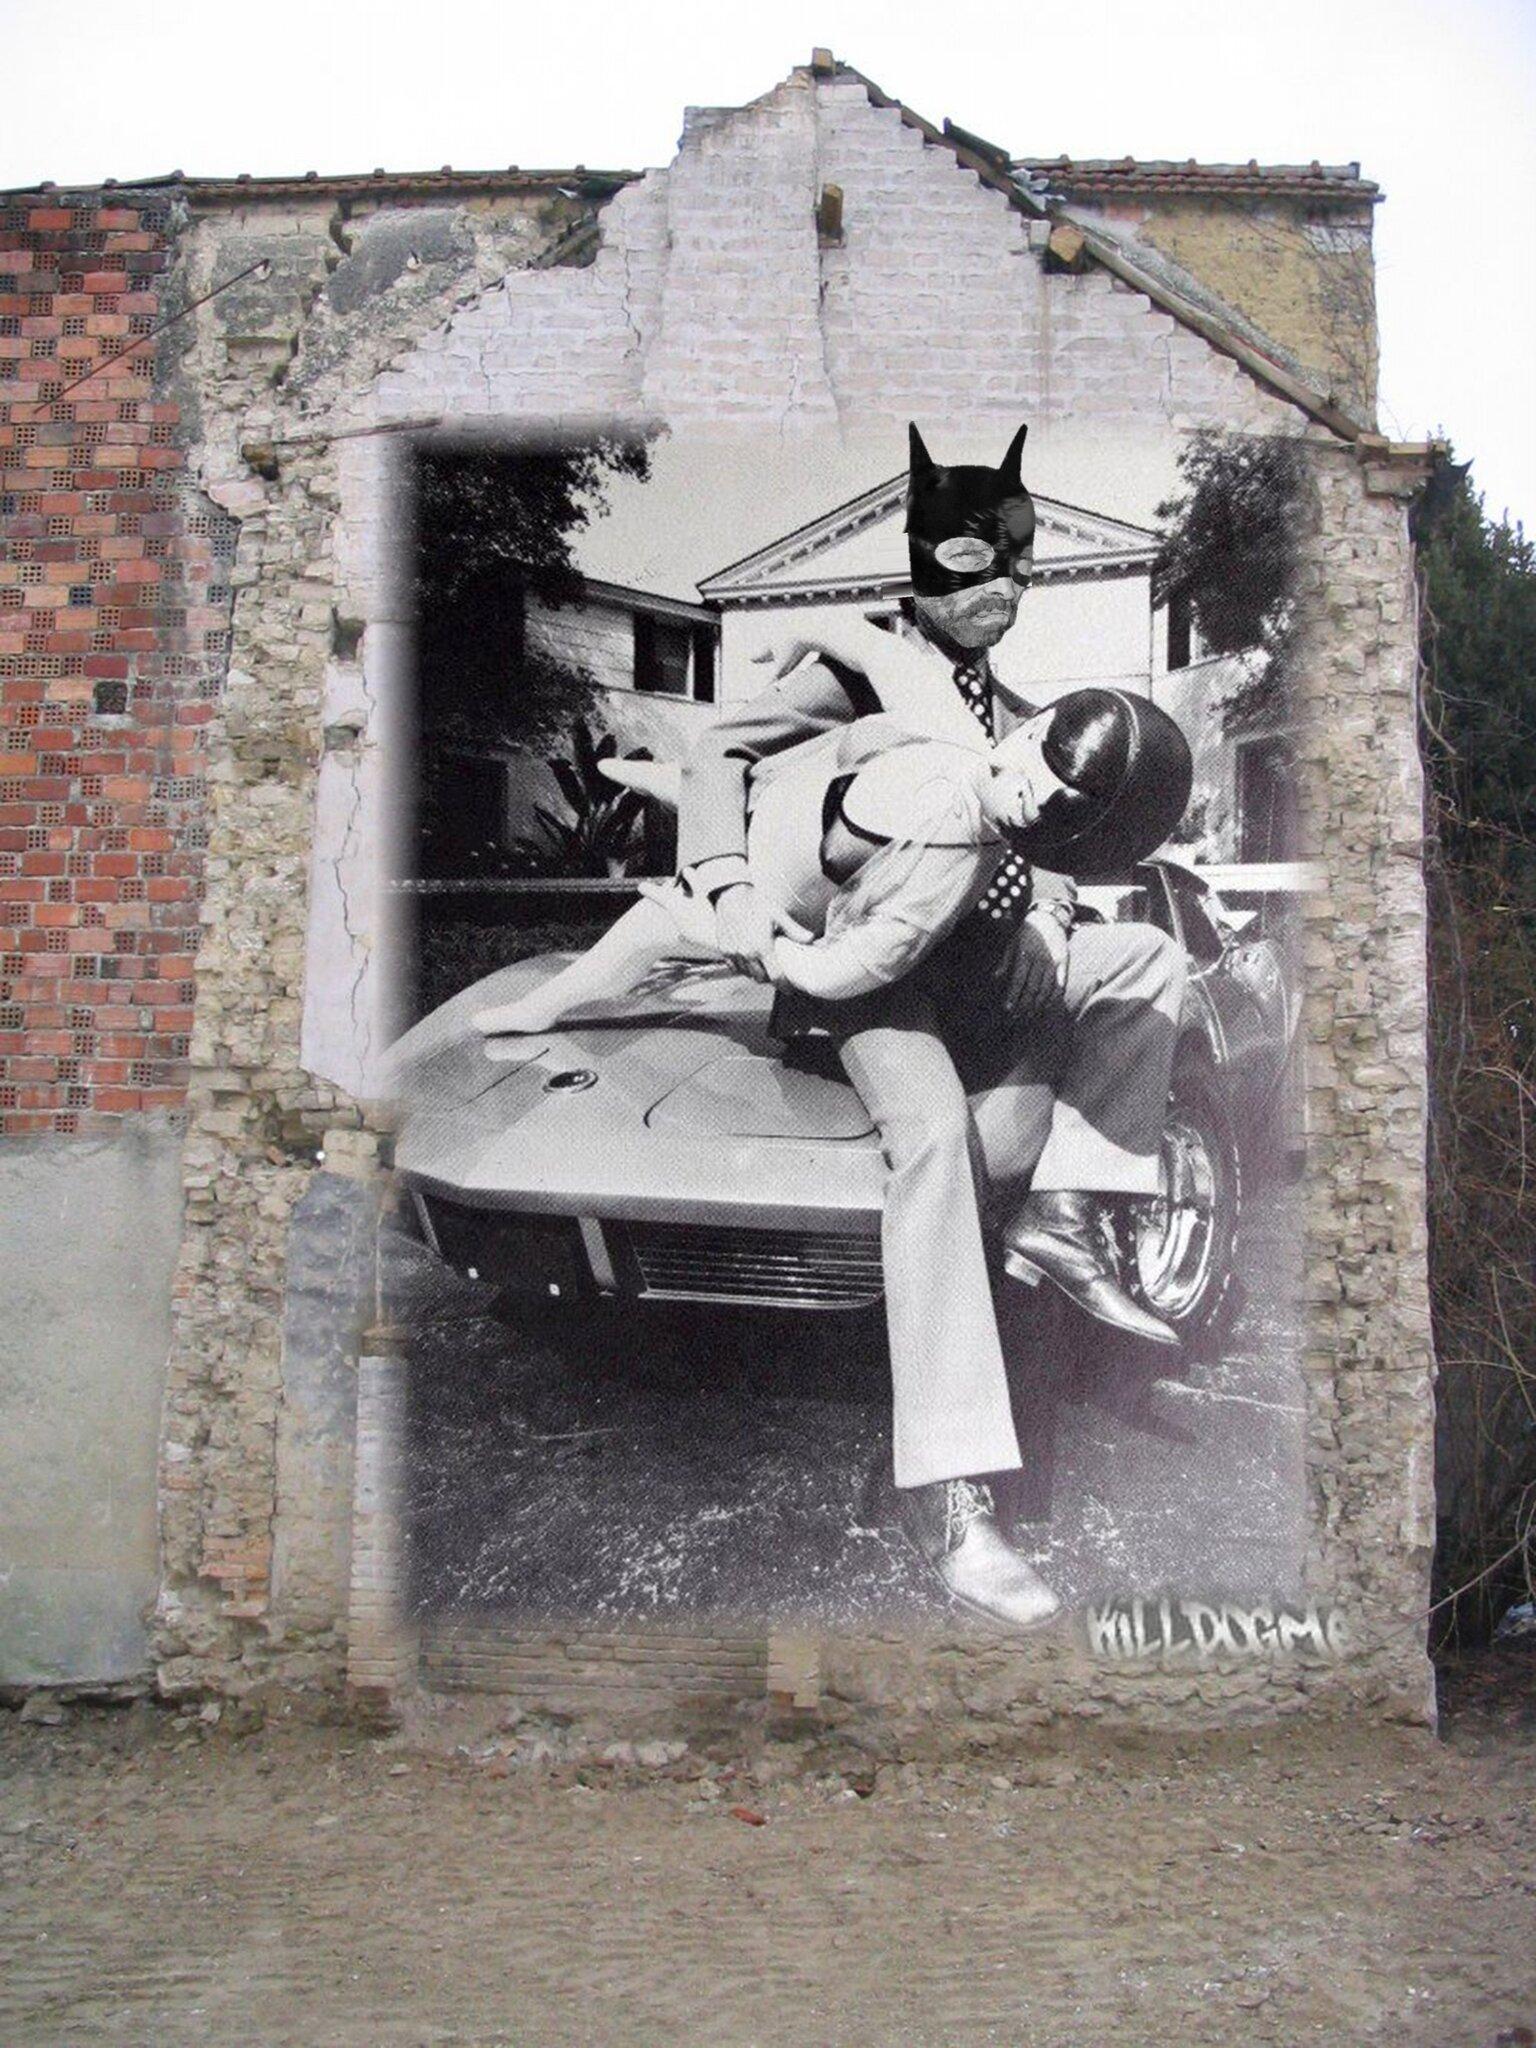 lucian freud killdogme banksy graffiti artists graffiti. Black Bedroom Furniture Sets. Home Design Ideas